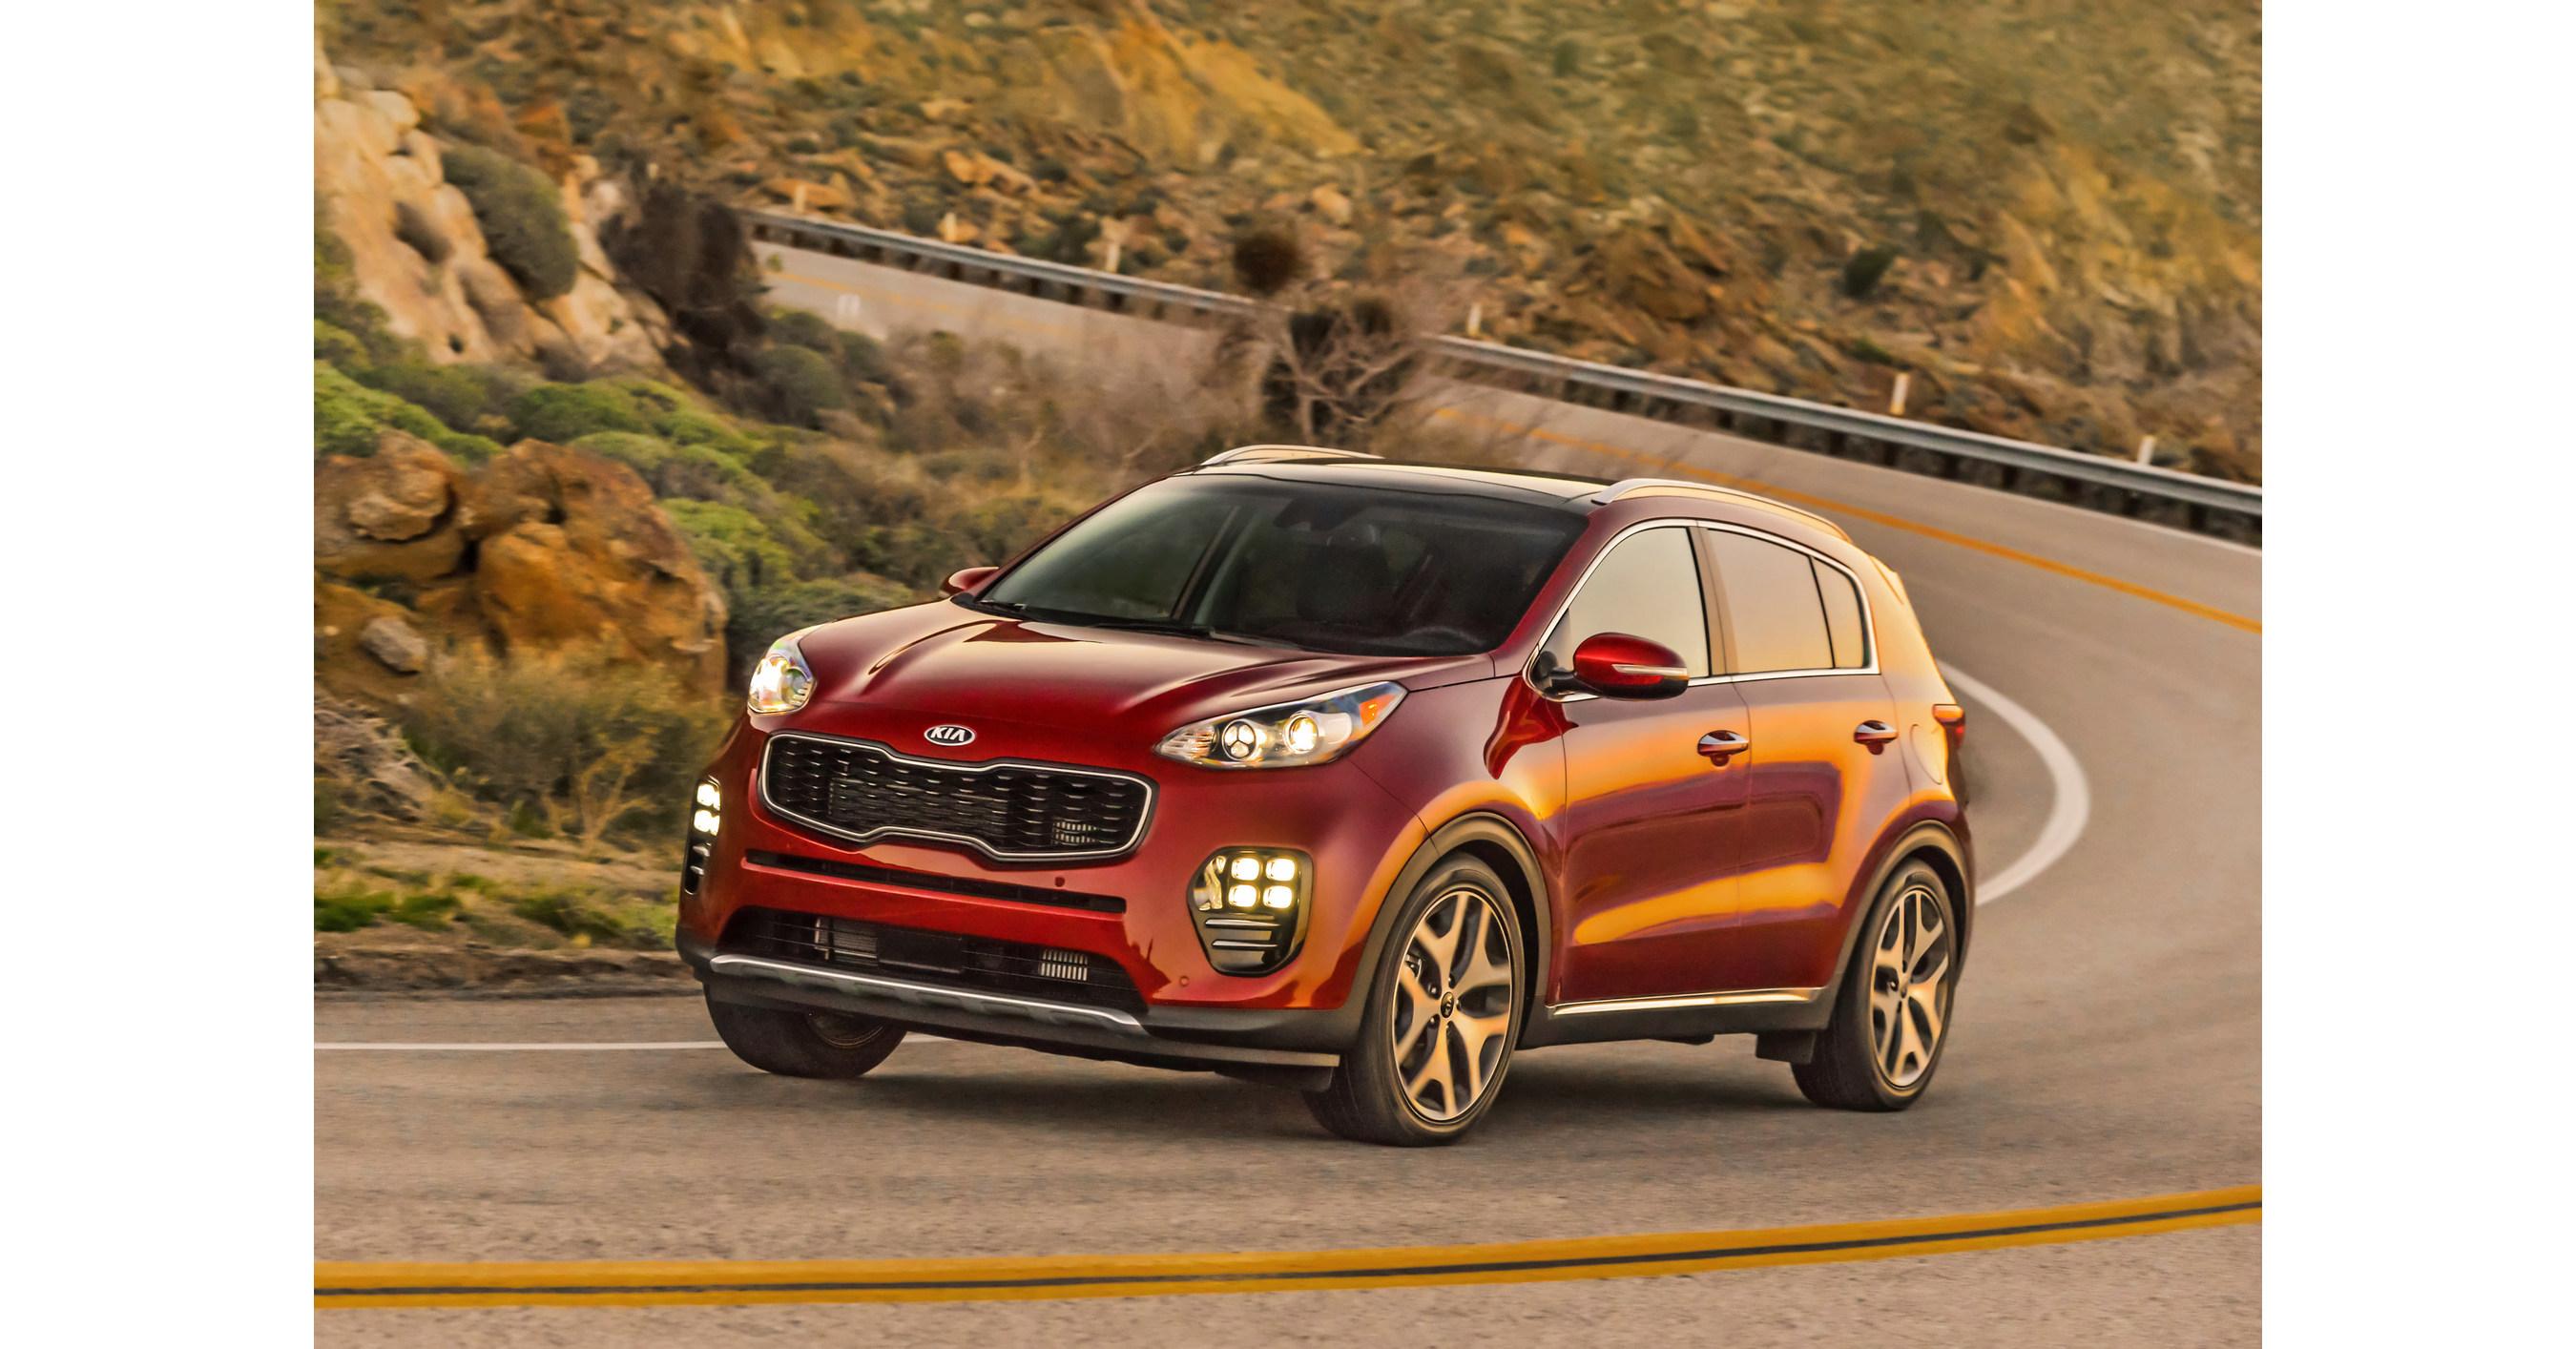 Kia sportage named a 2017 must test drive vehicle by for Kia motors usa com